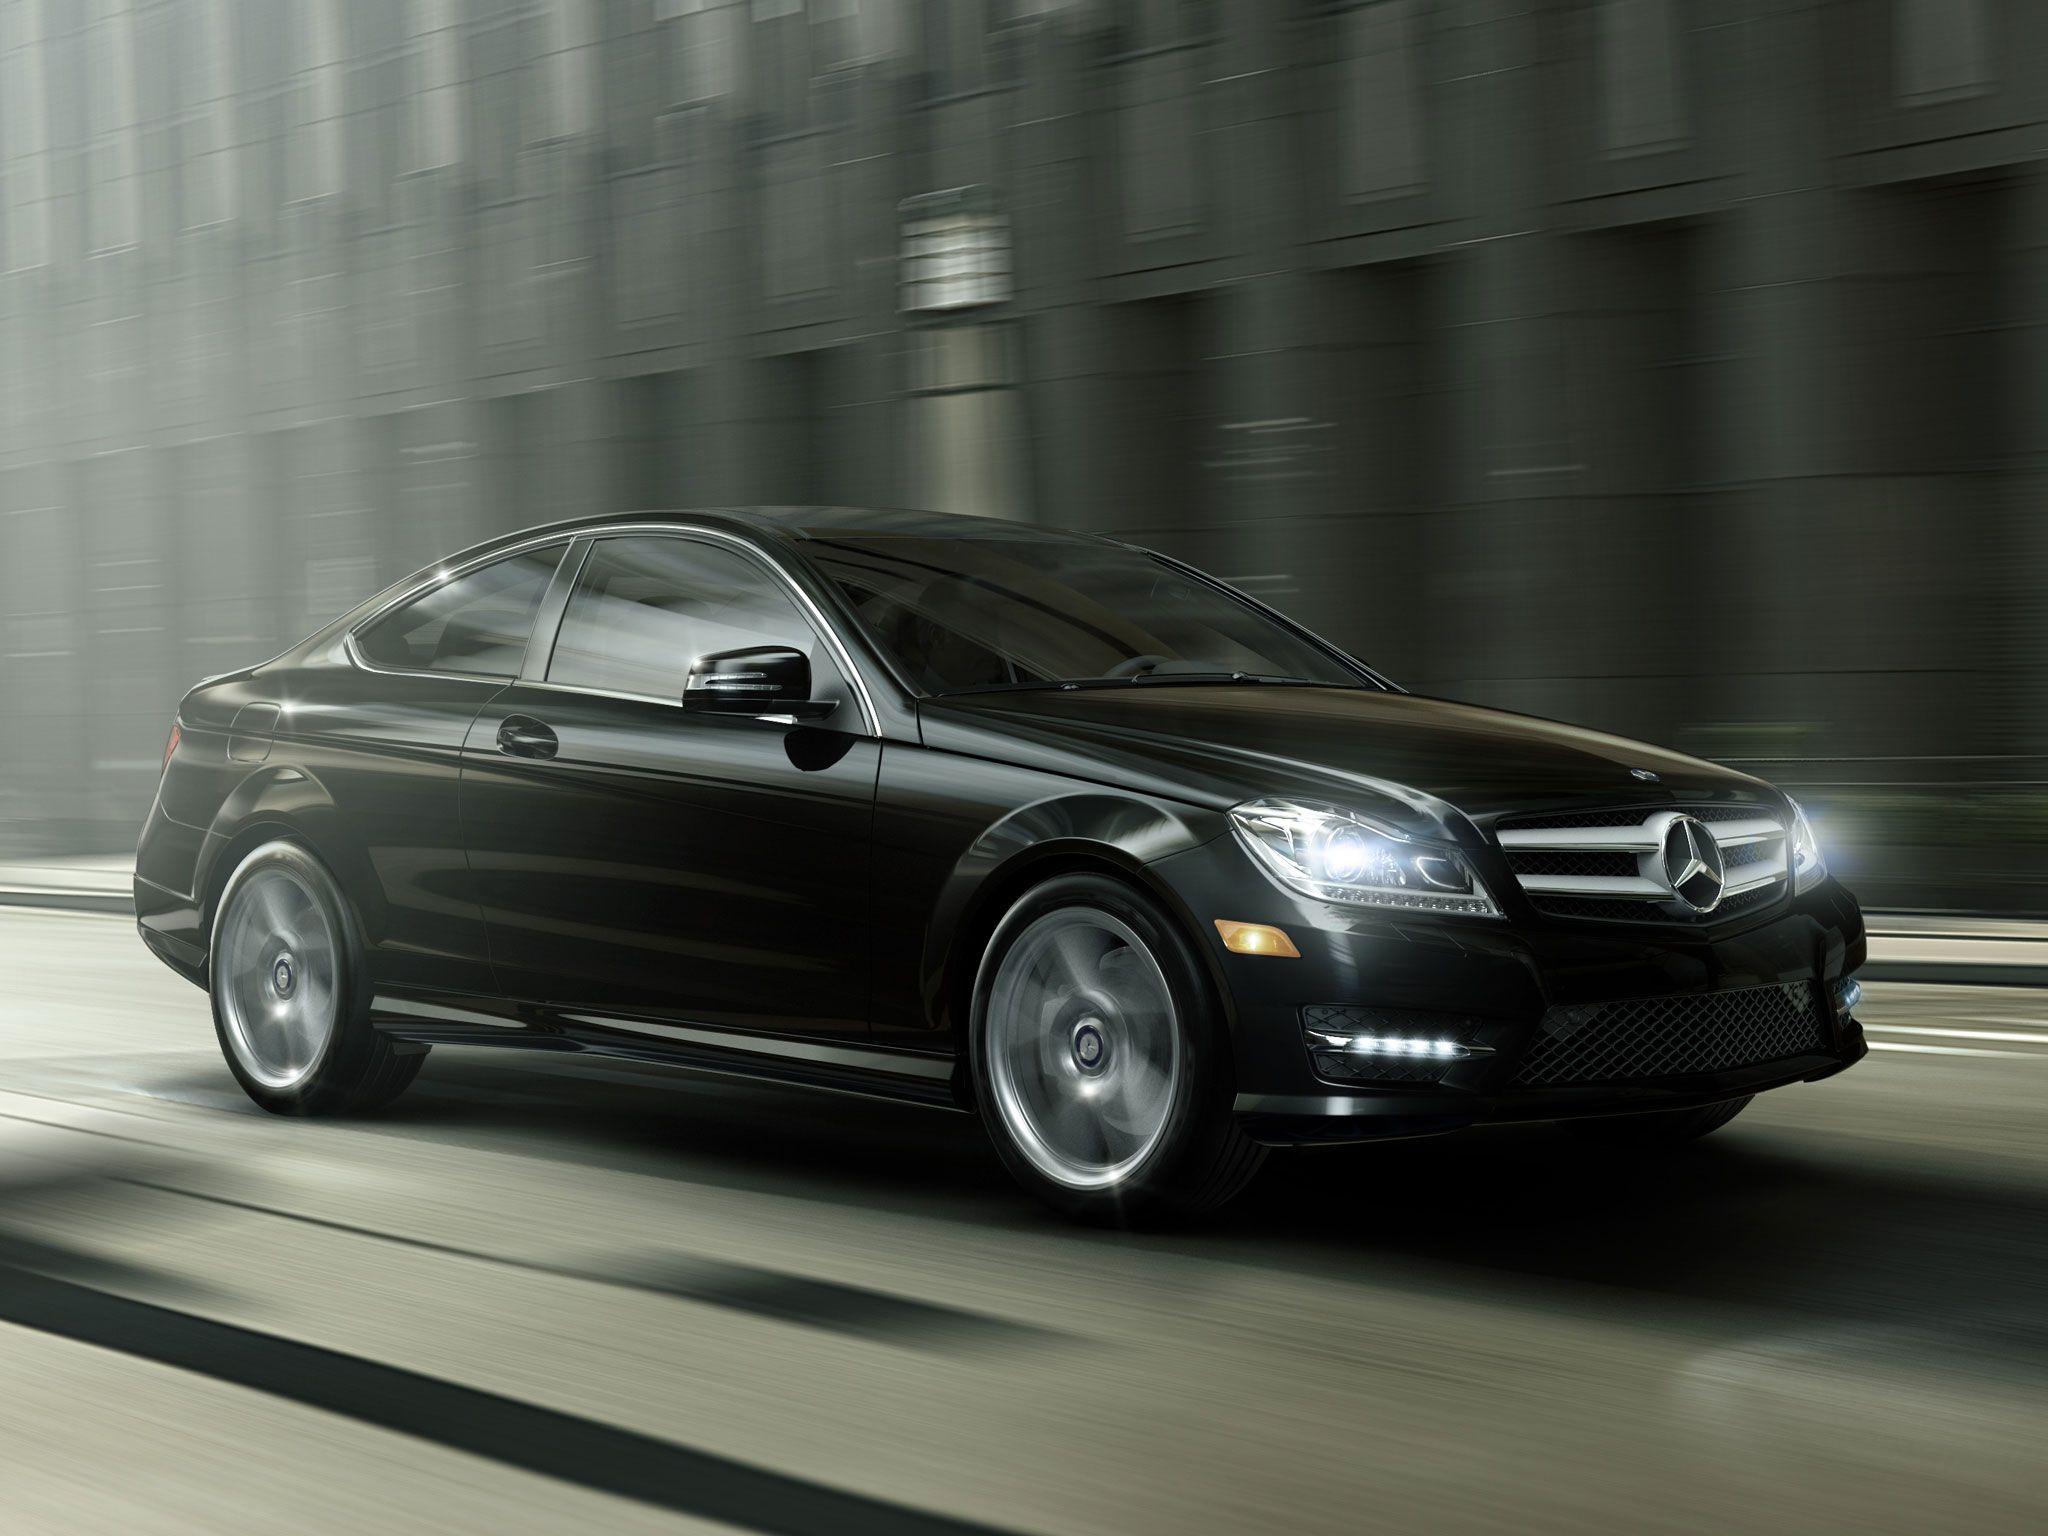 Mercedes C Class Coupe 2014 Black Www Pixshark Com